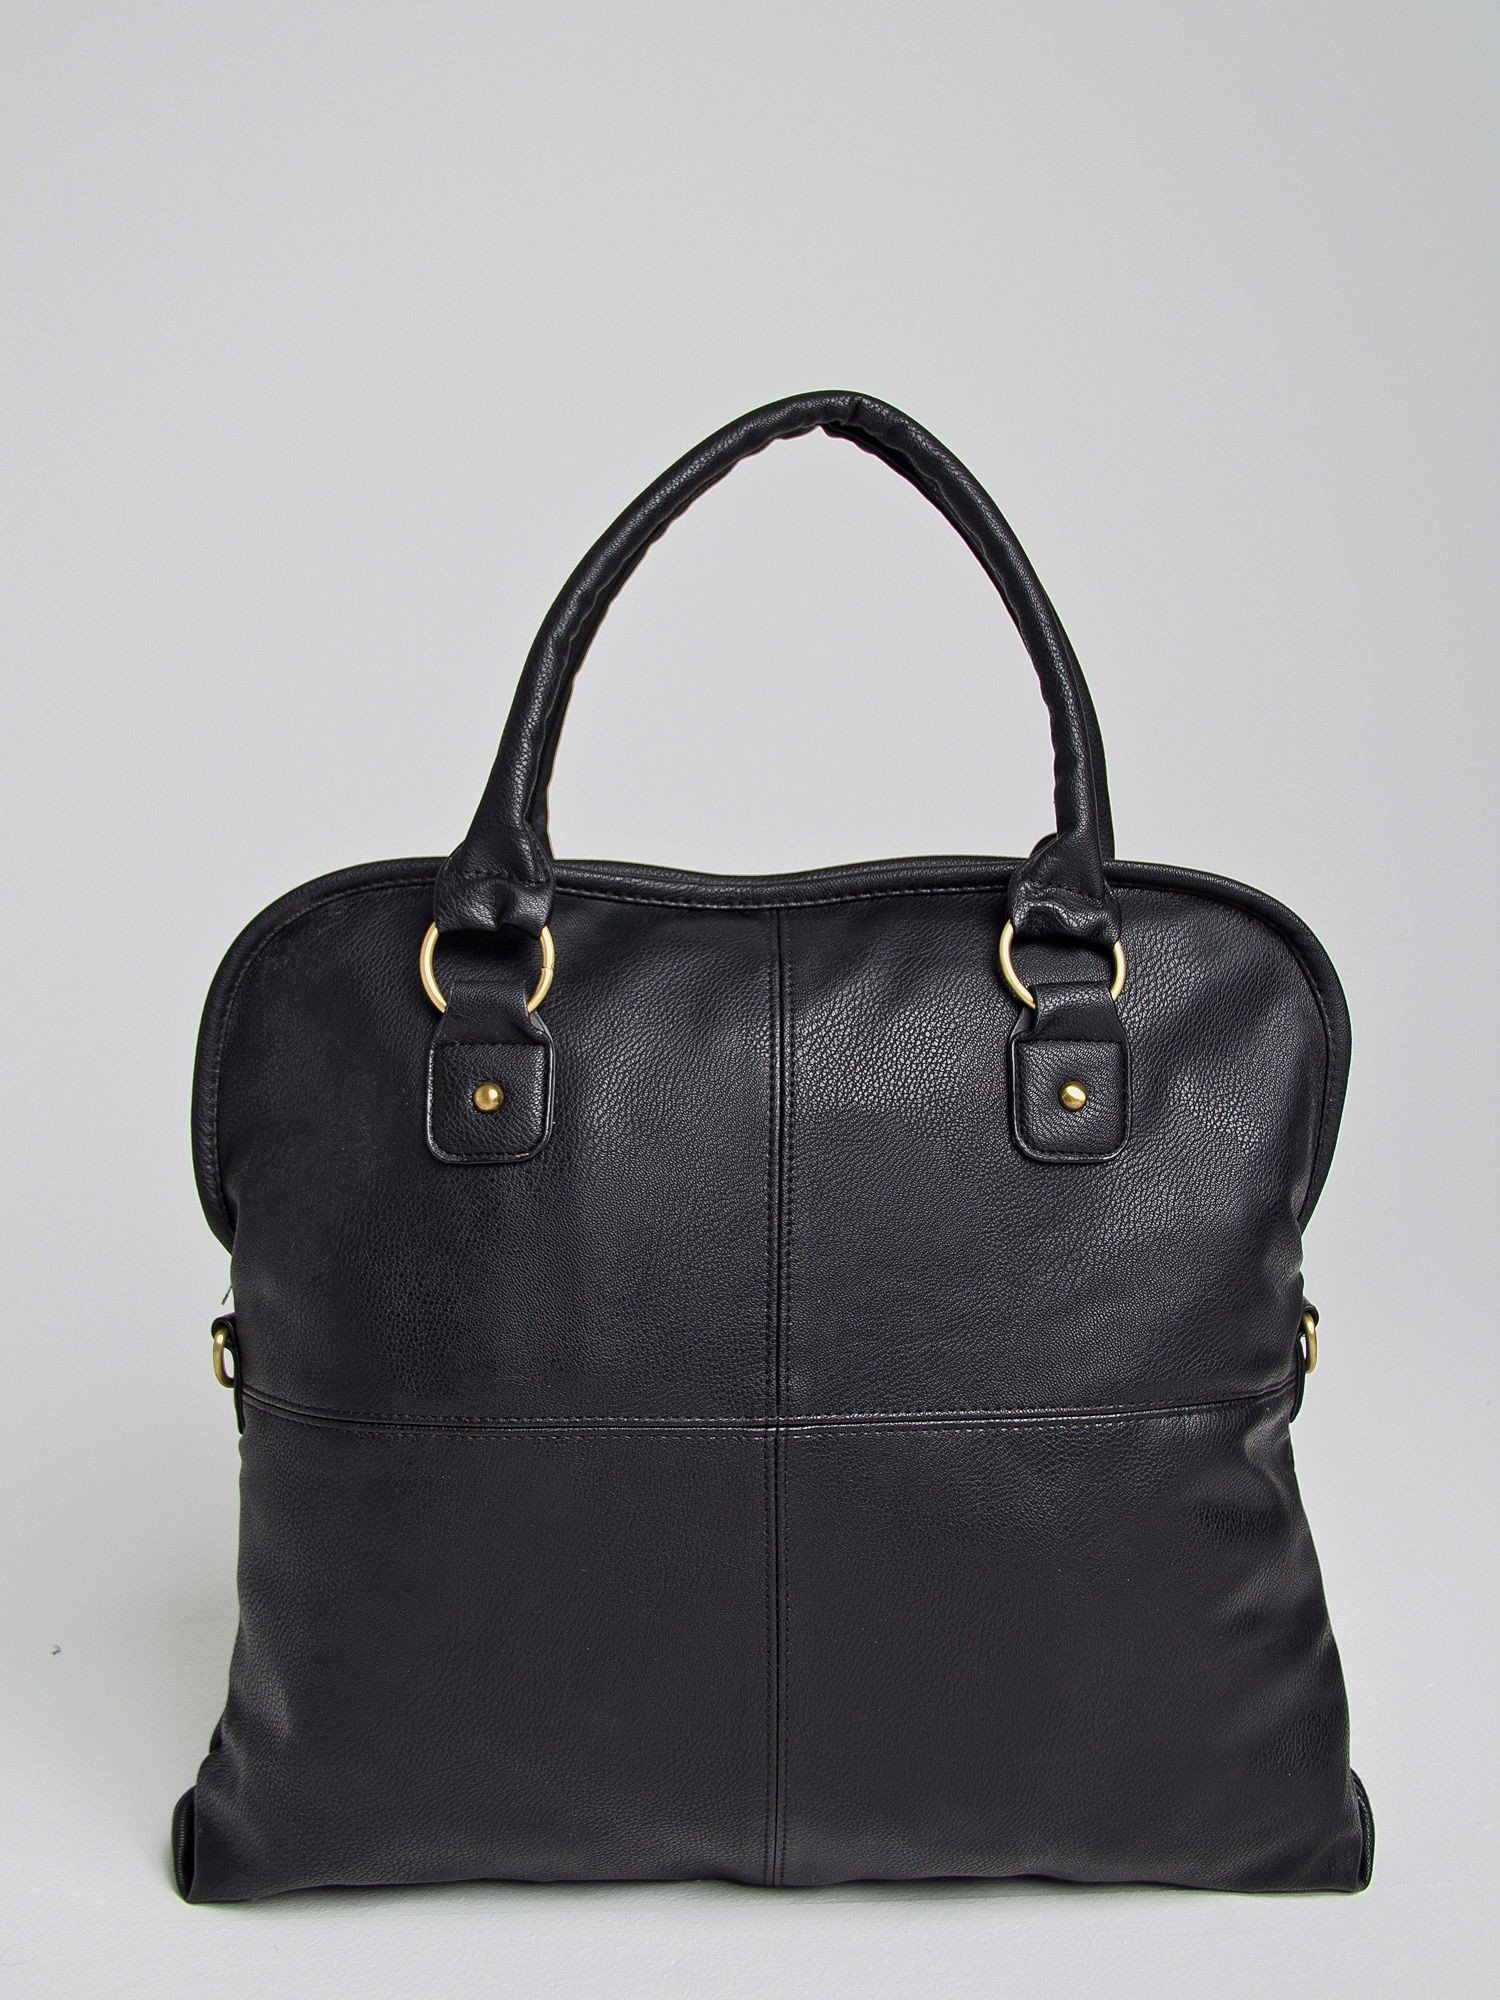 Czarna torba miejska na ramię                                  zdj.                                  1